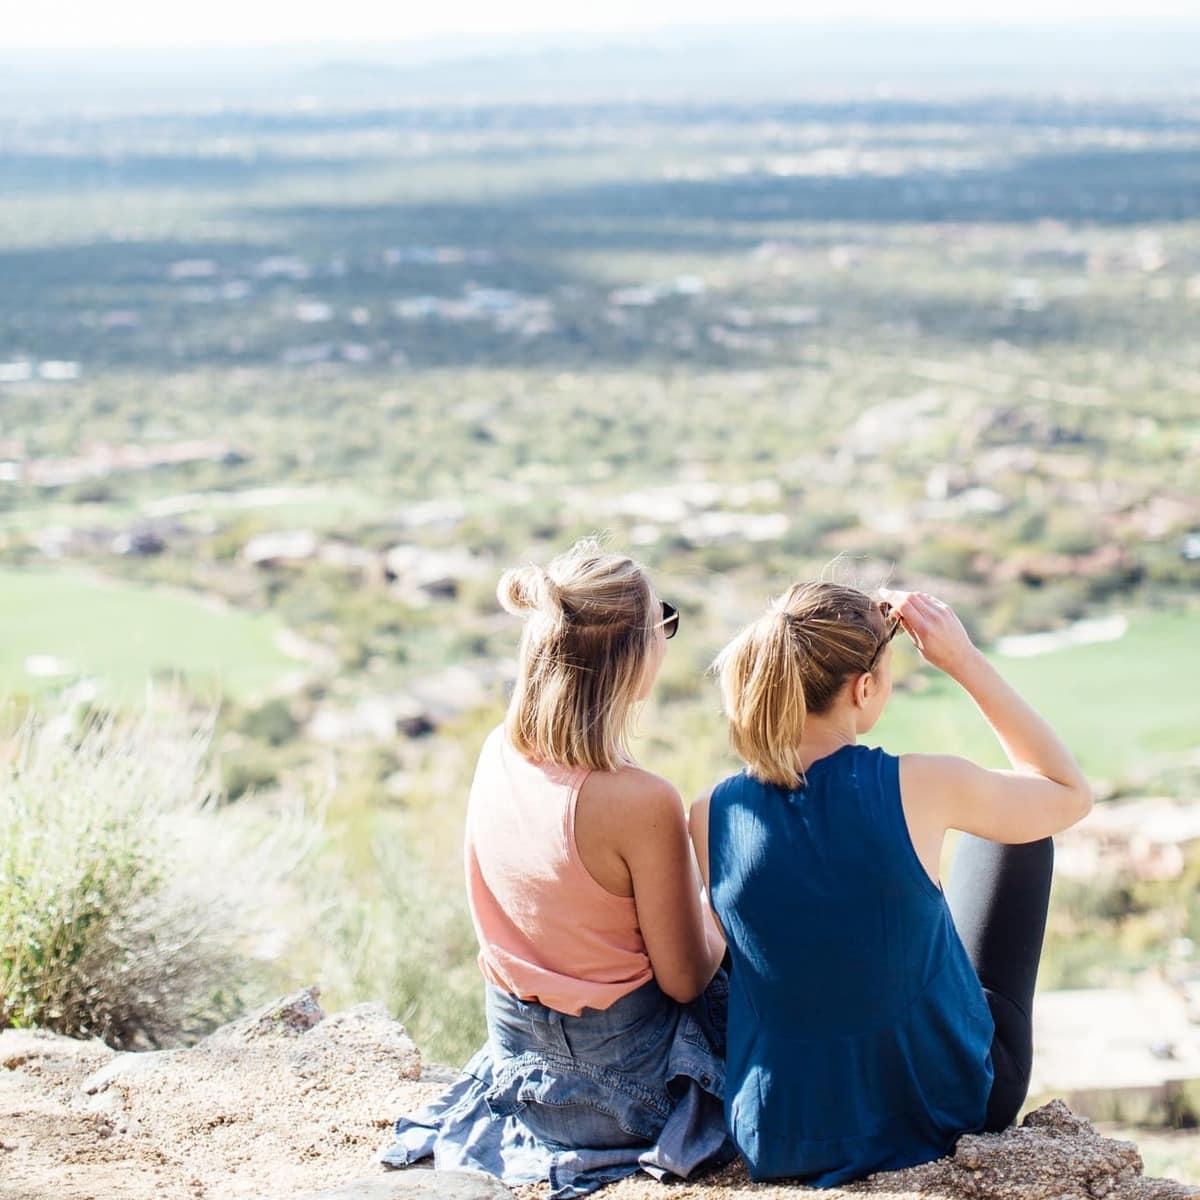 Lee and Monique atop Pinnacle Peak in AZ